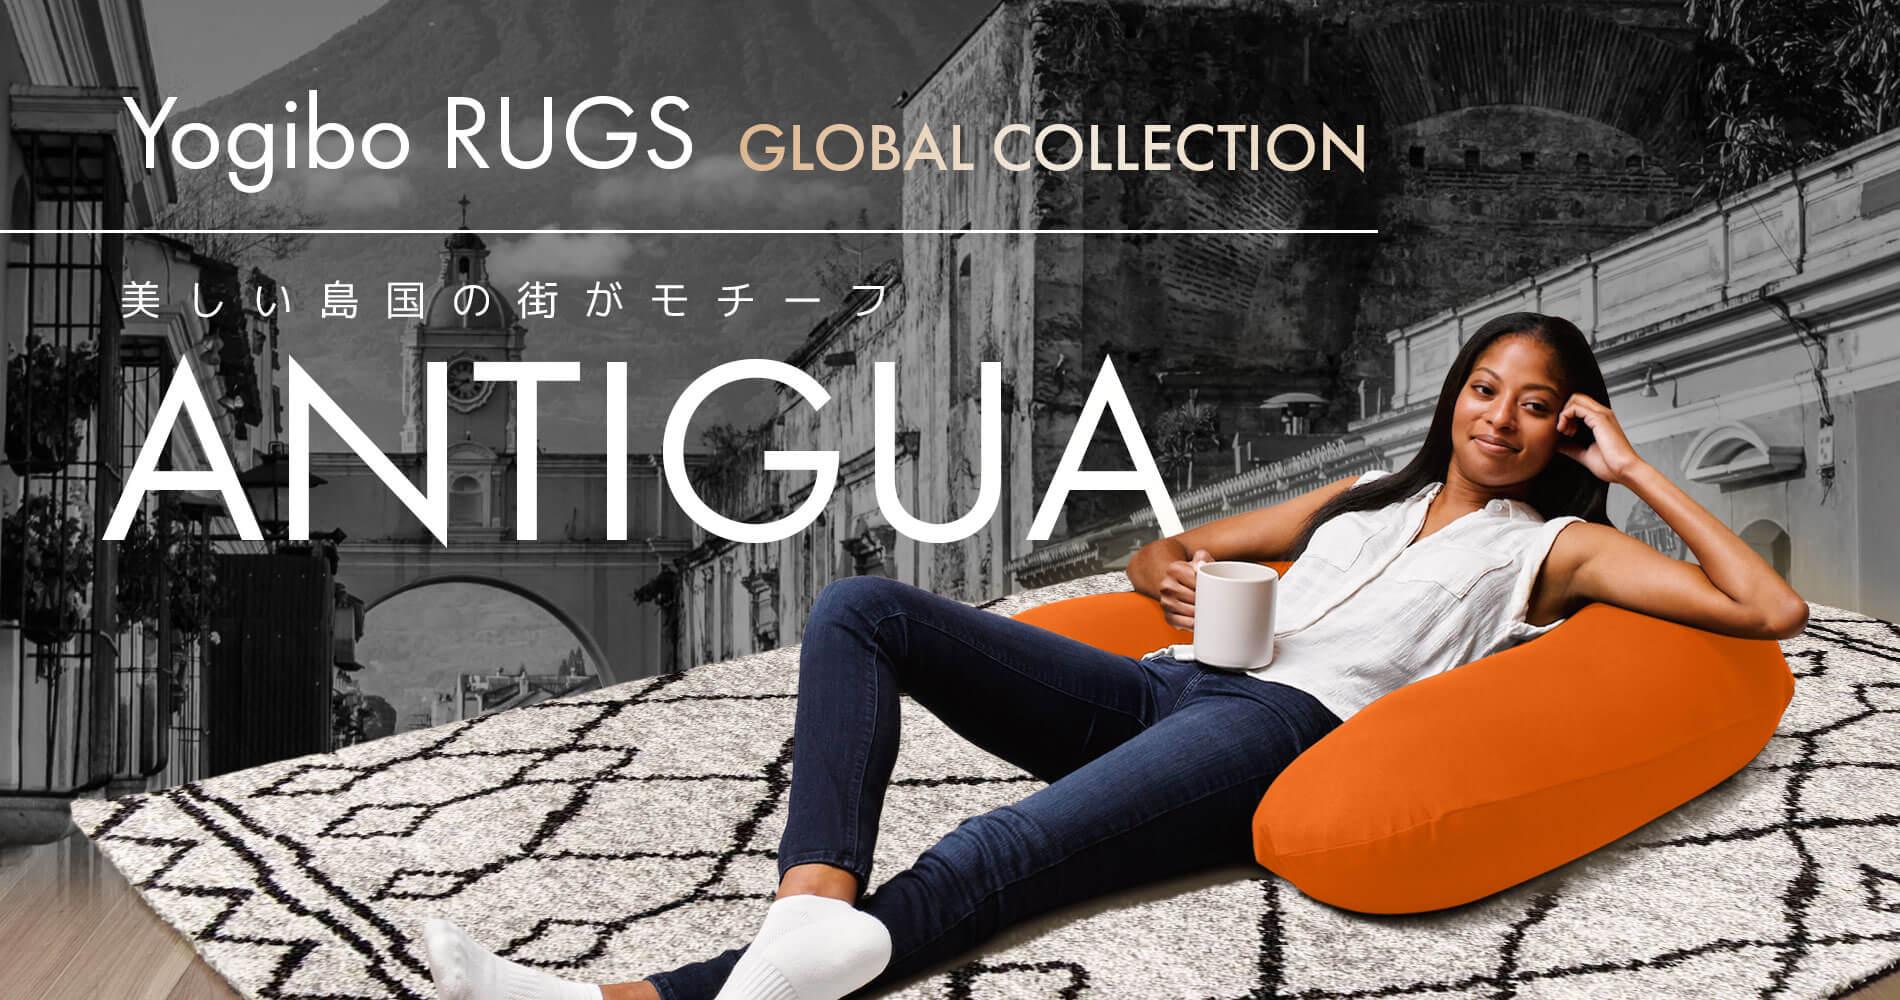 Yogibo Rugs Antigua(ヨギボーラグ アンティグア)